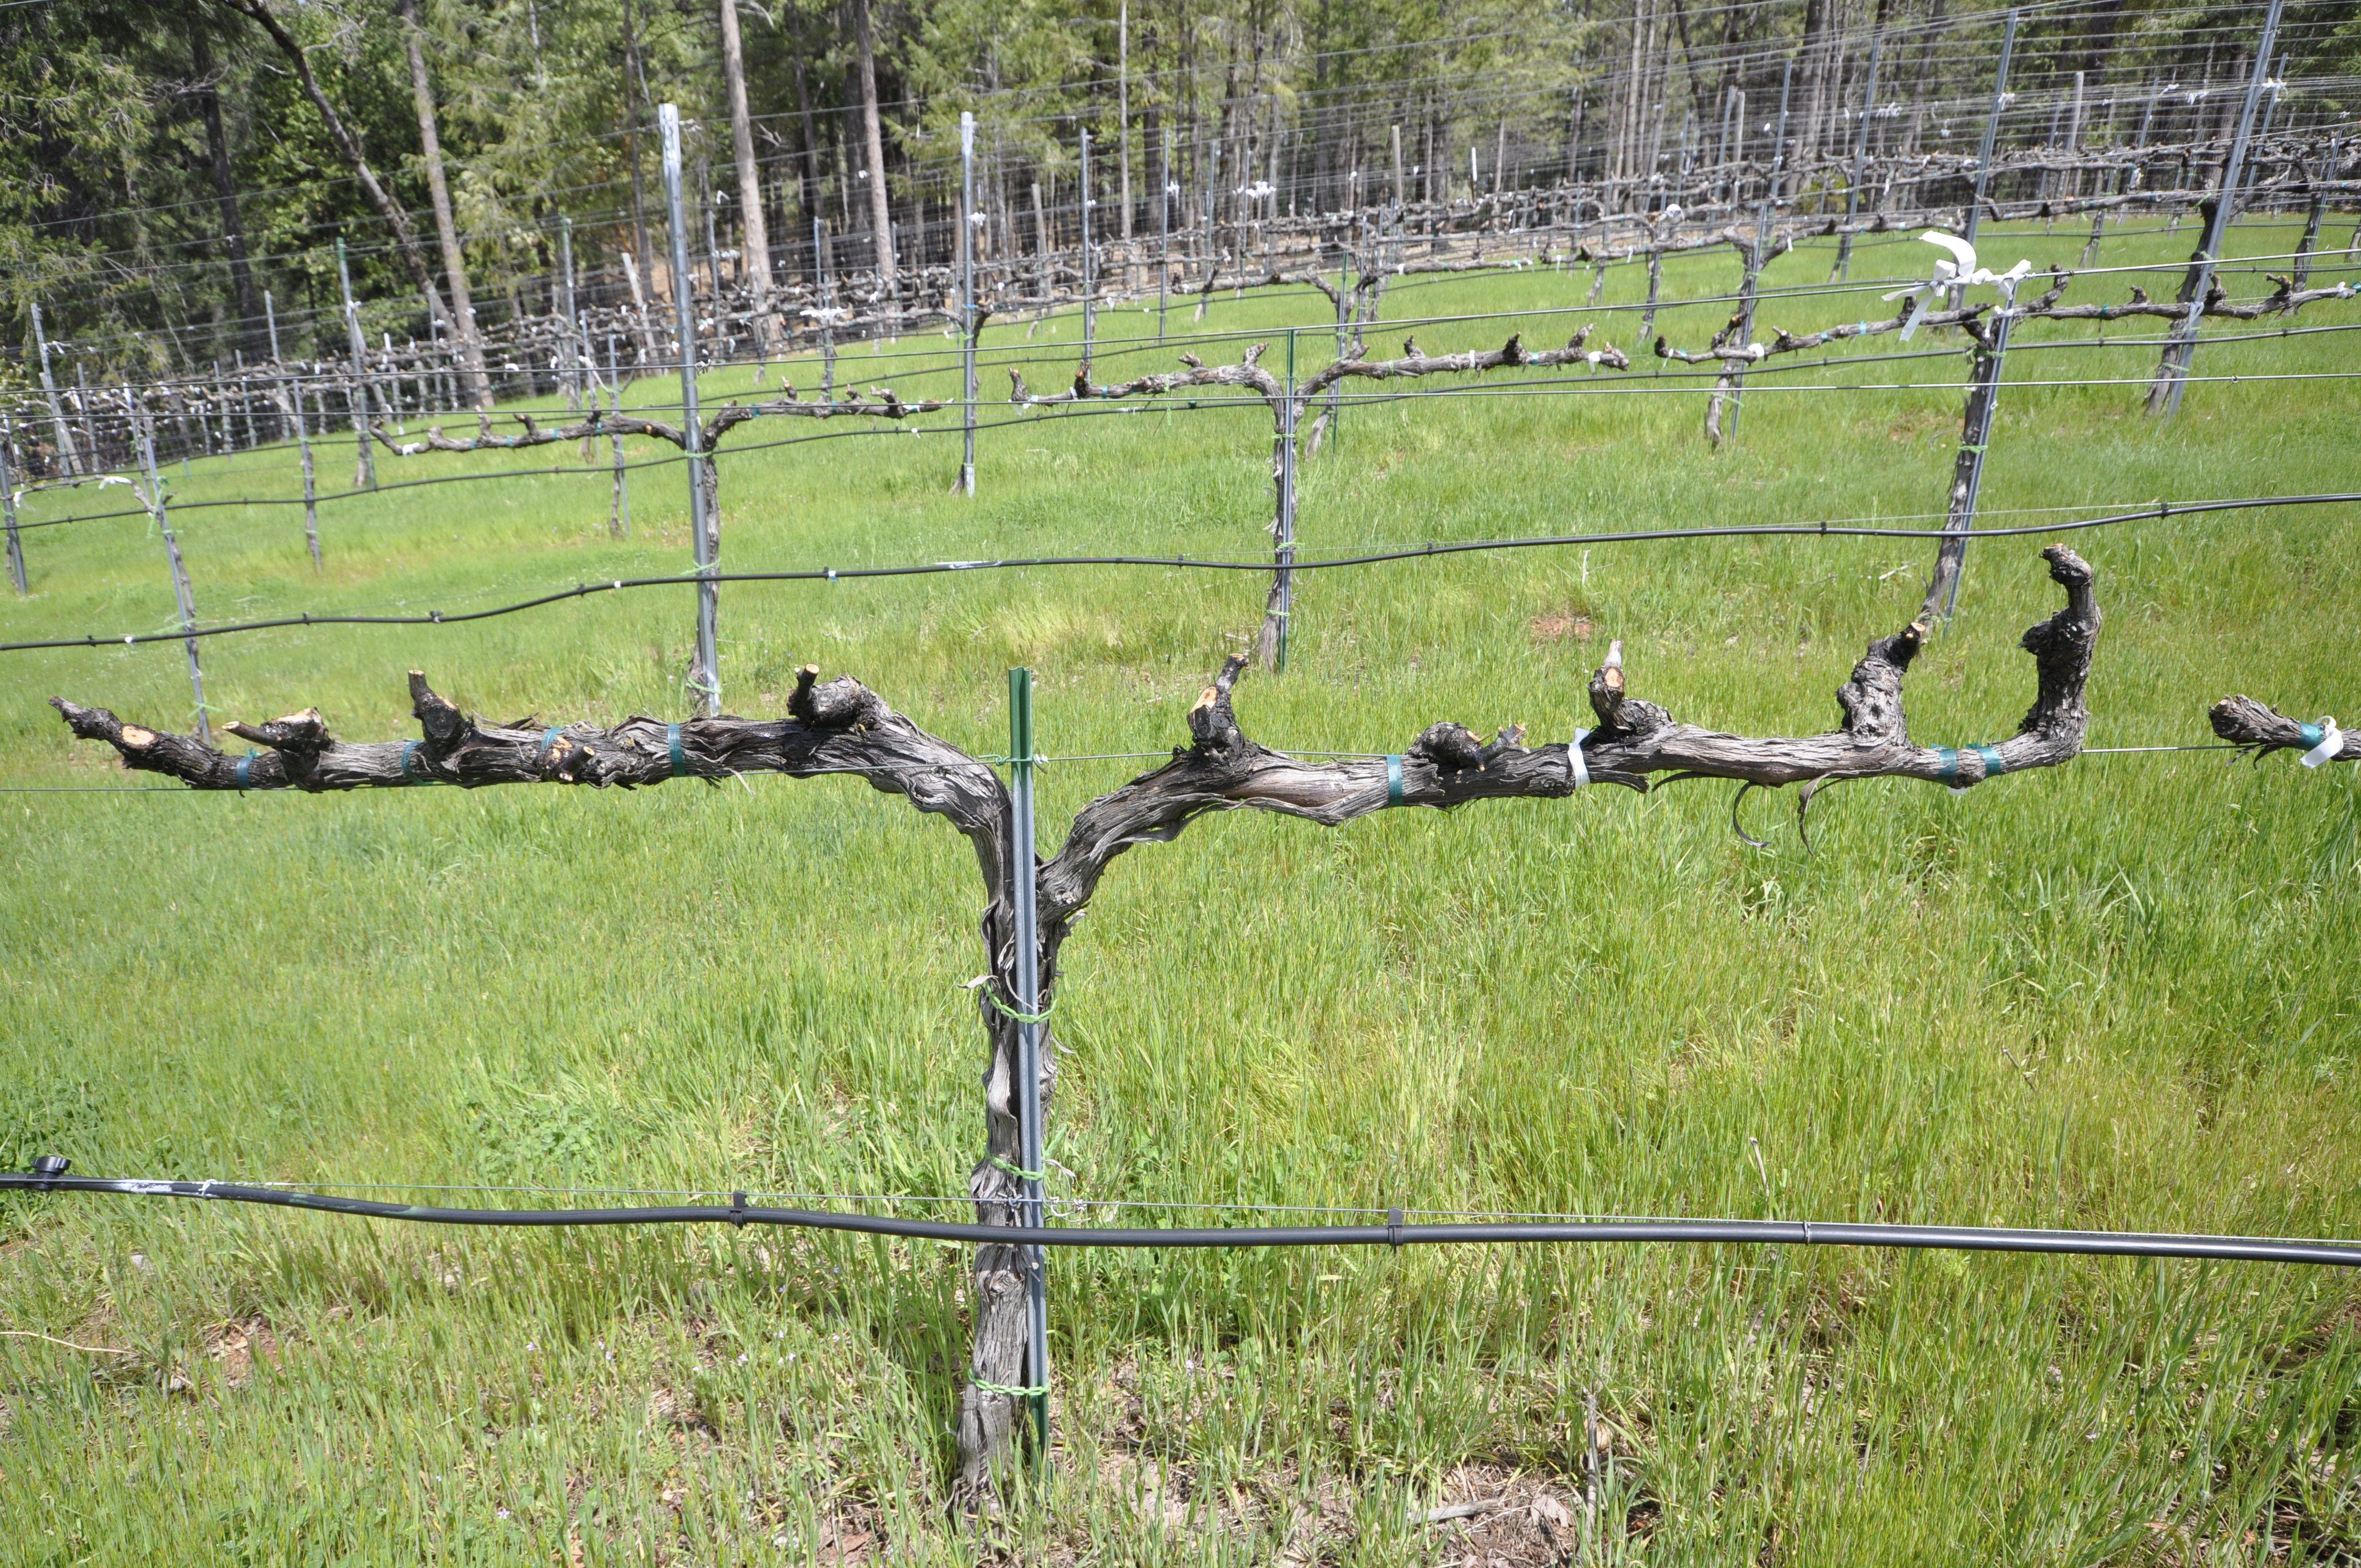 Grape Vine Trellis Ideas Part - 24: Grape Pruning Guide Grape Stem,grape Tree For Sale Grape Vine Trellis Ideas, Grapes Grow On Trees Or Vines How Long Do Grape Vines Live.